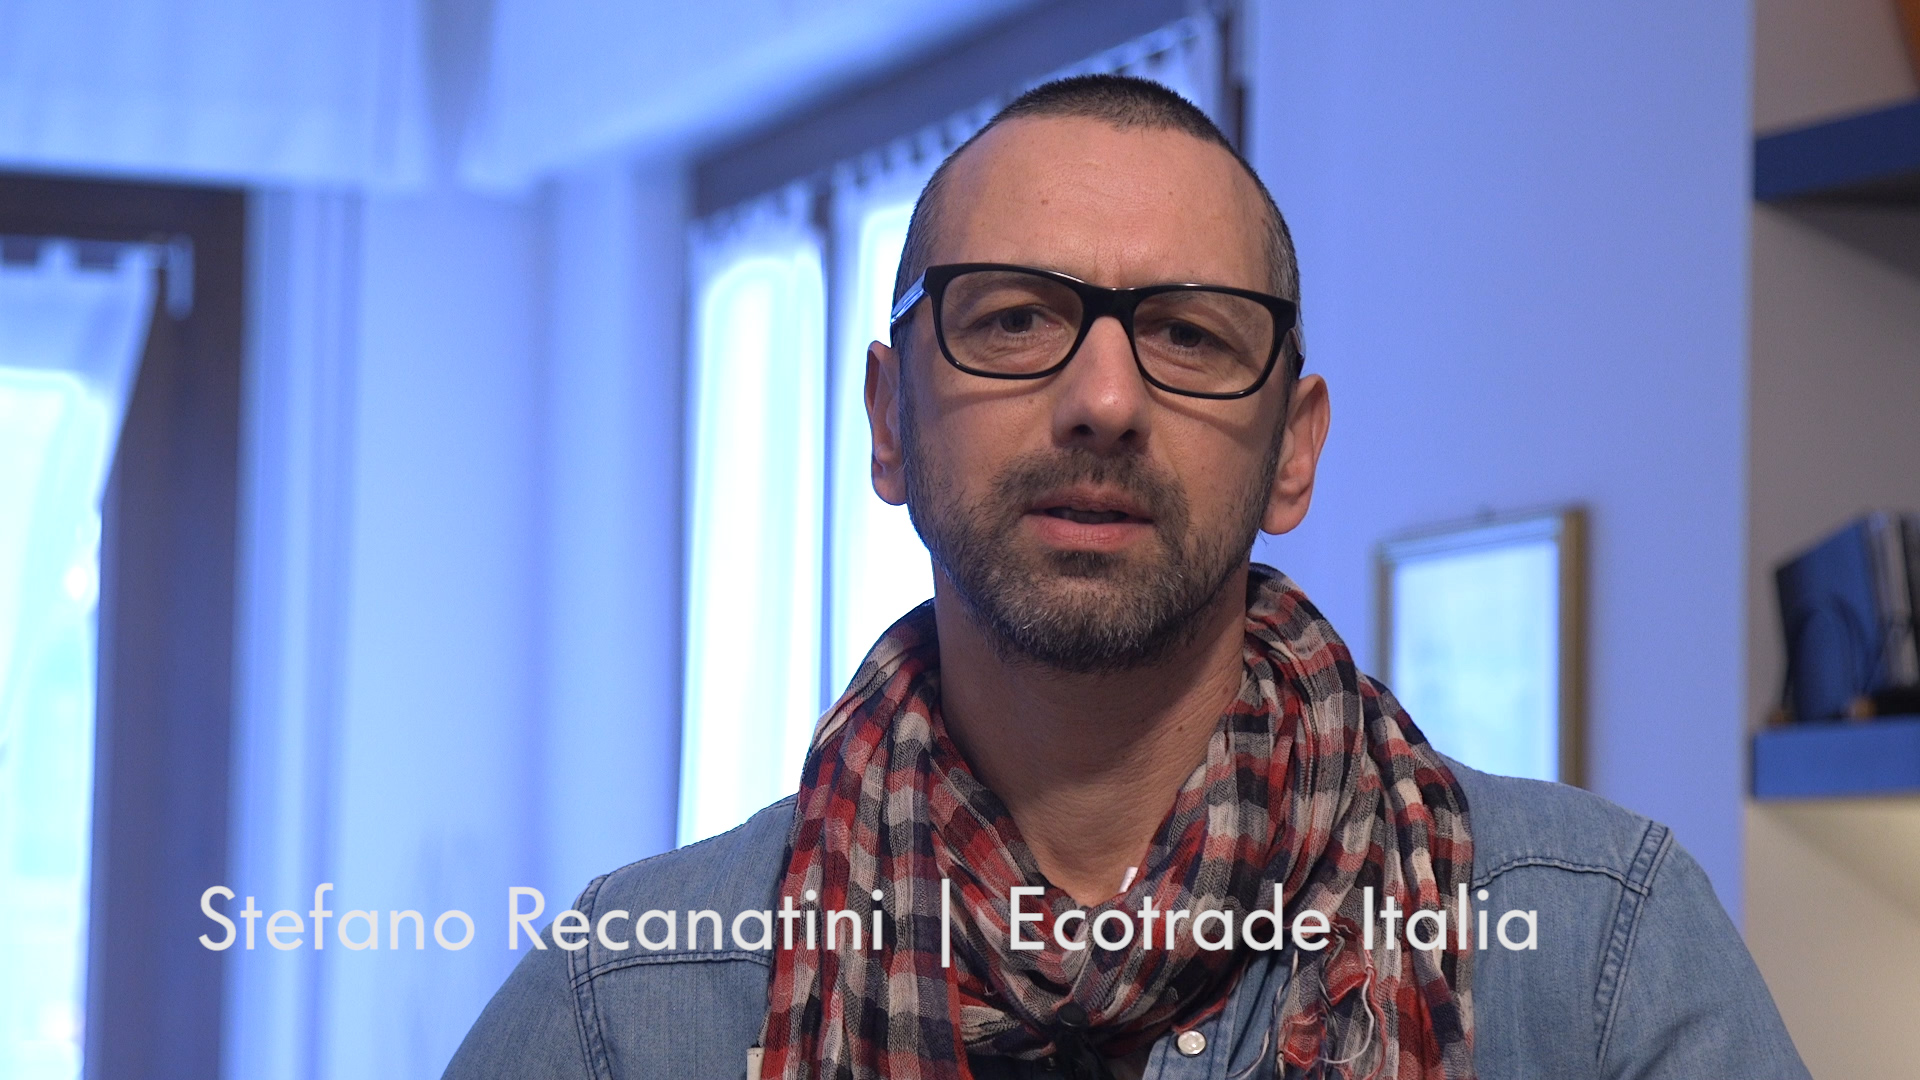 Stefano Recanatini